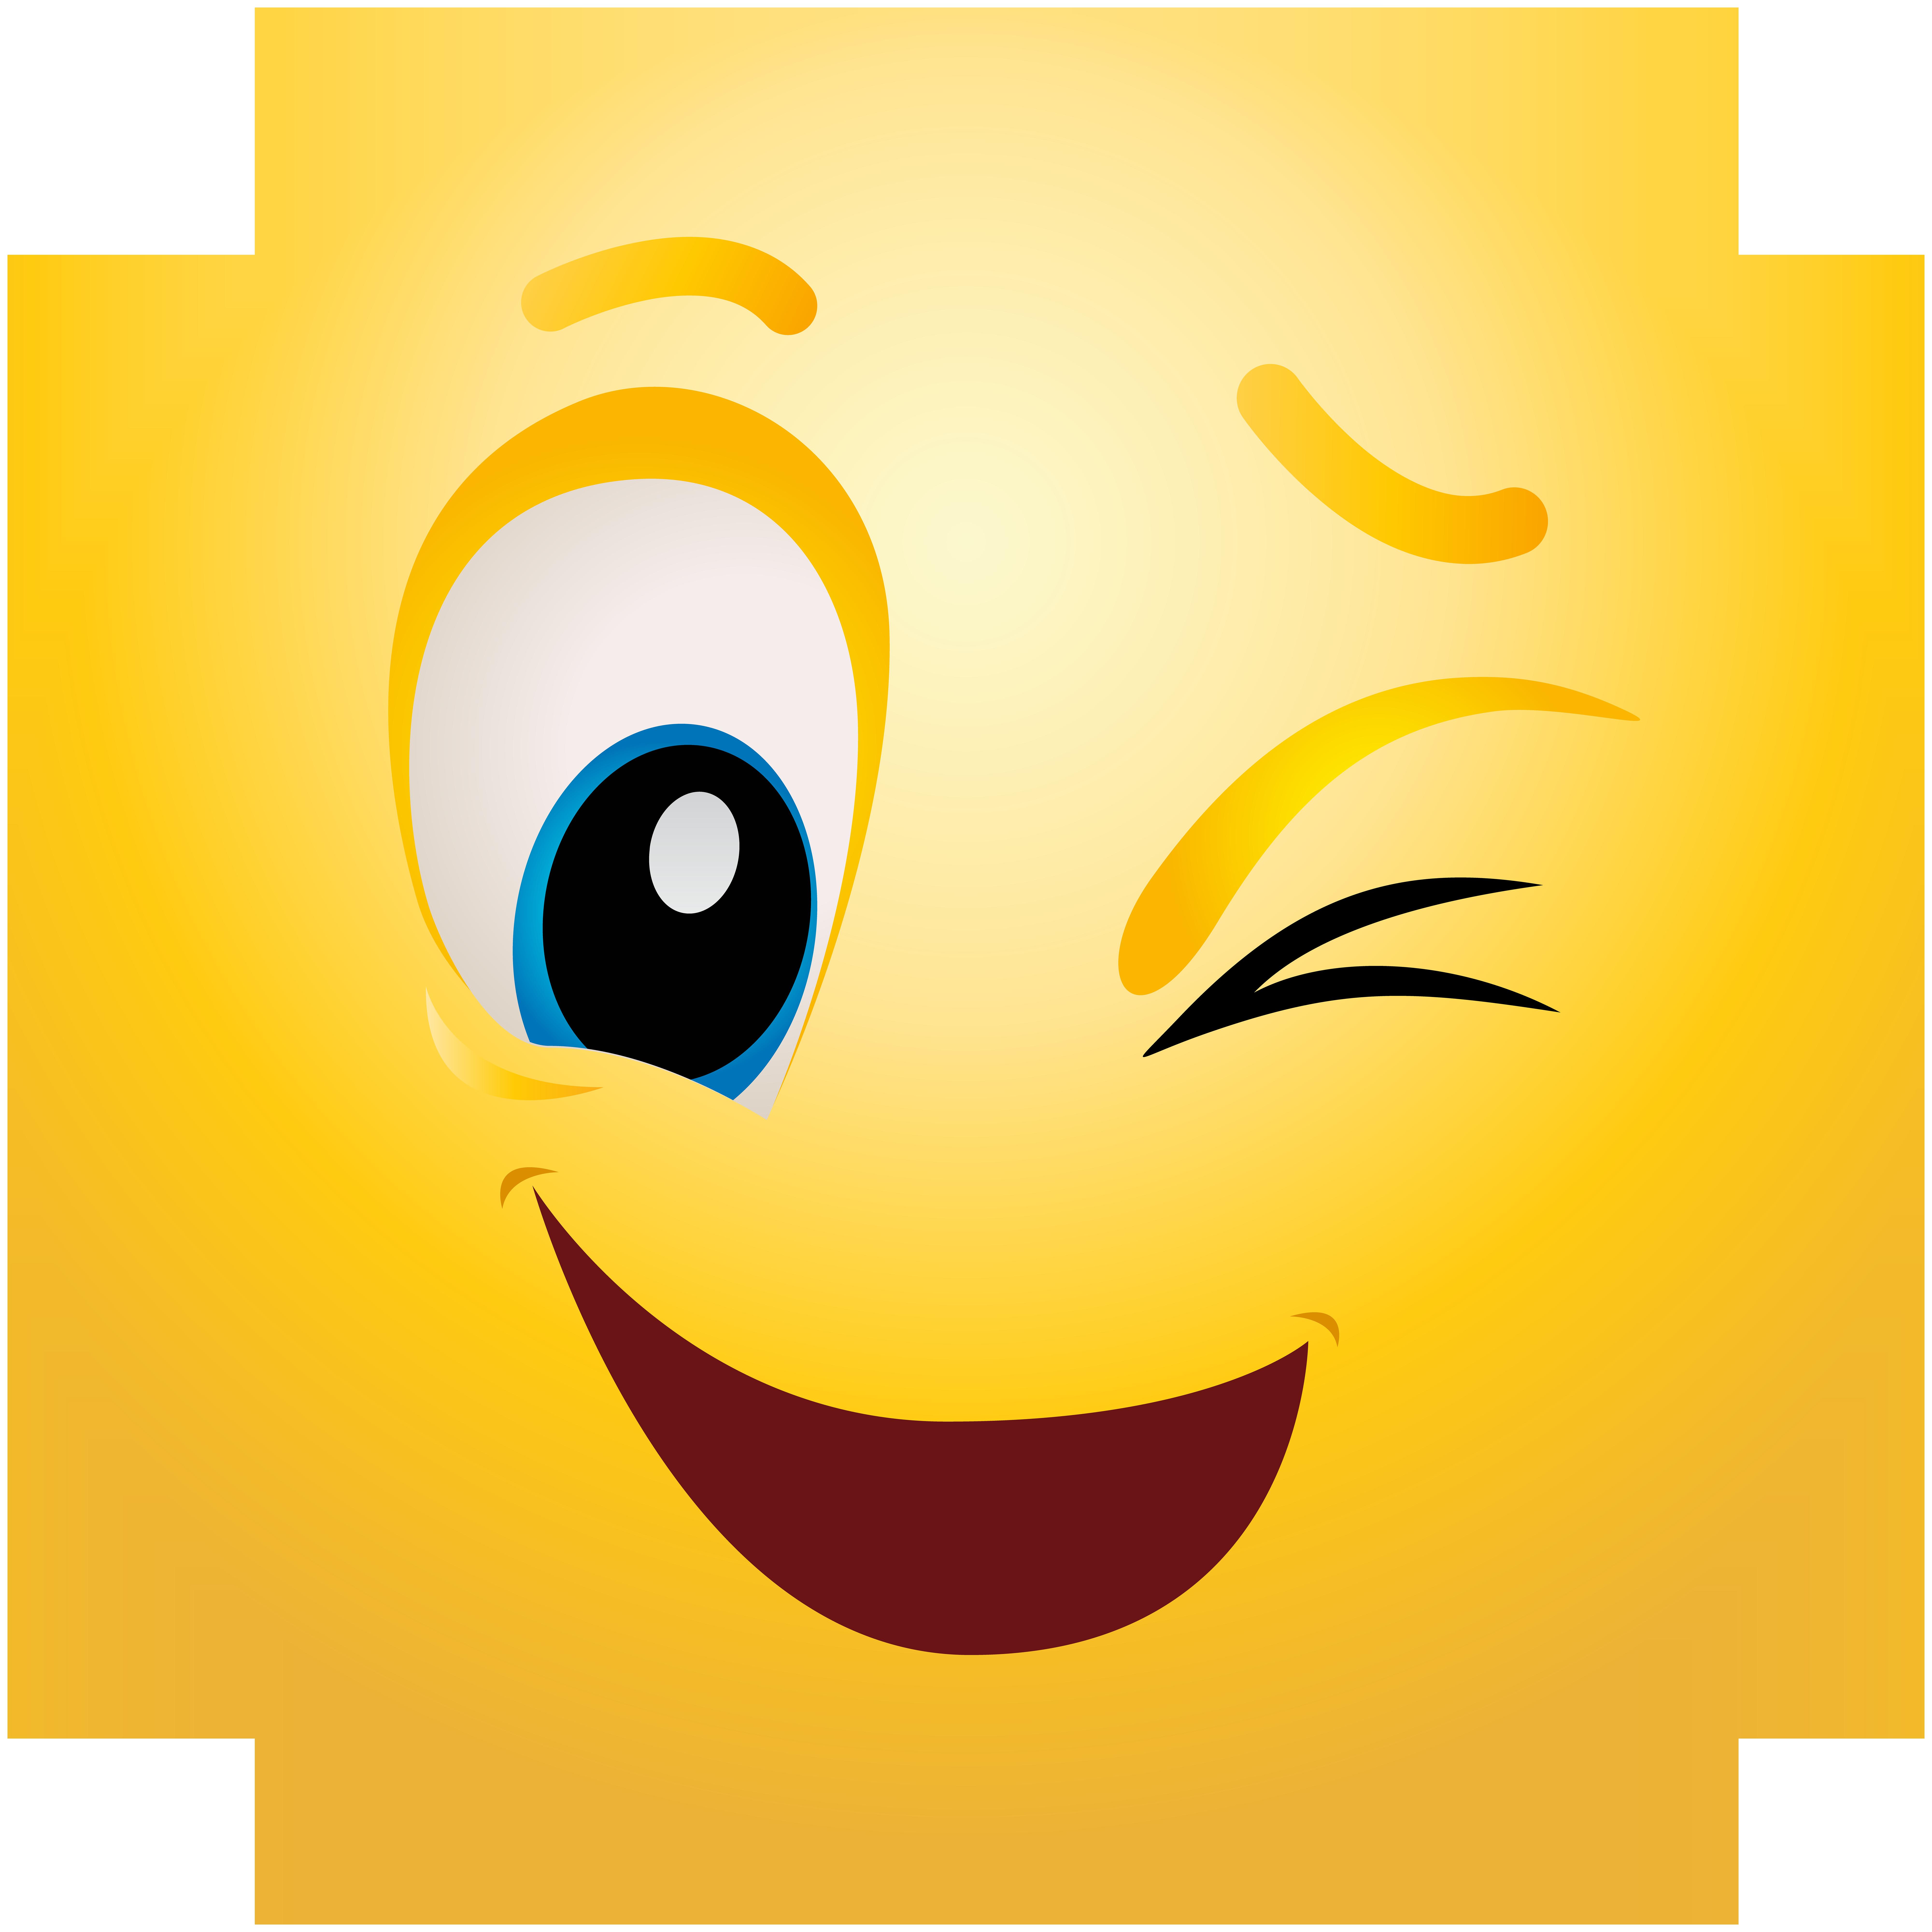 Winking emoji winking emoticon clip art web clipart.